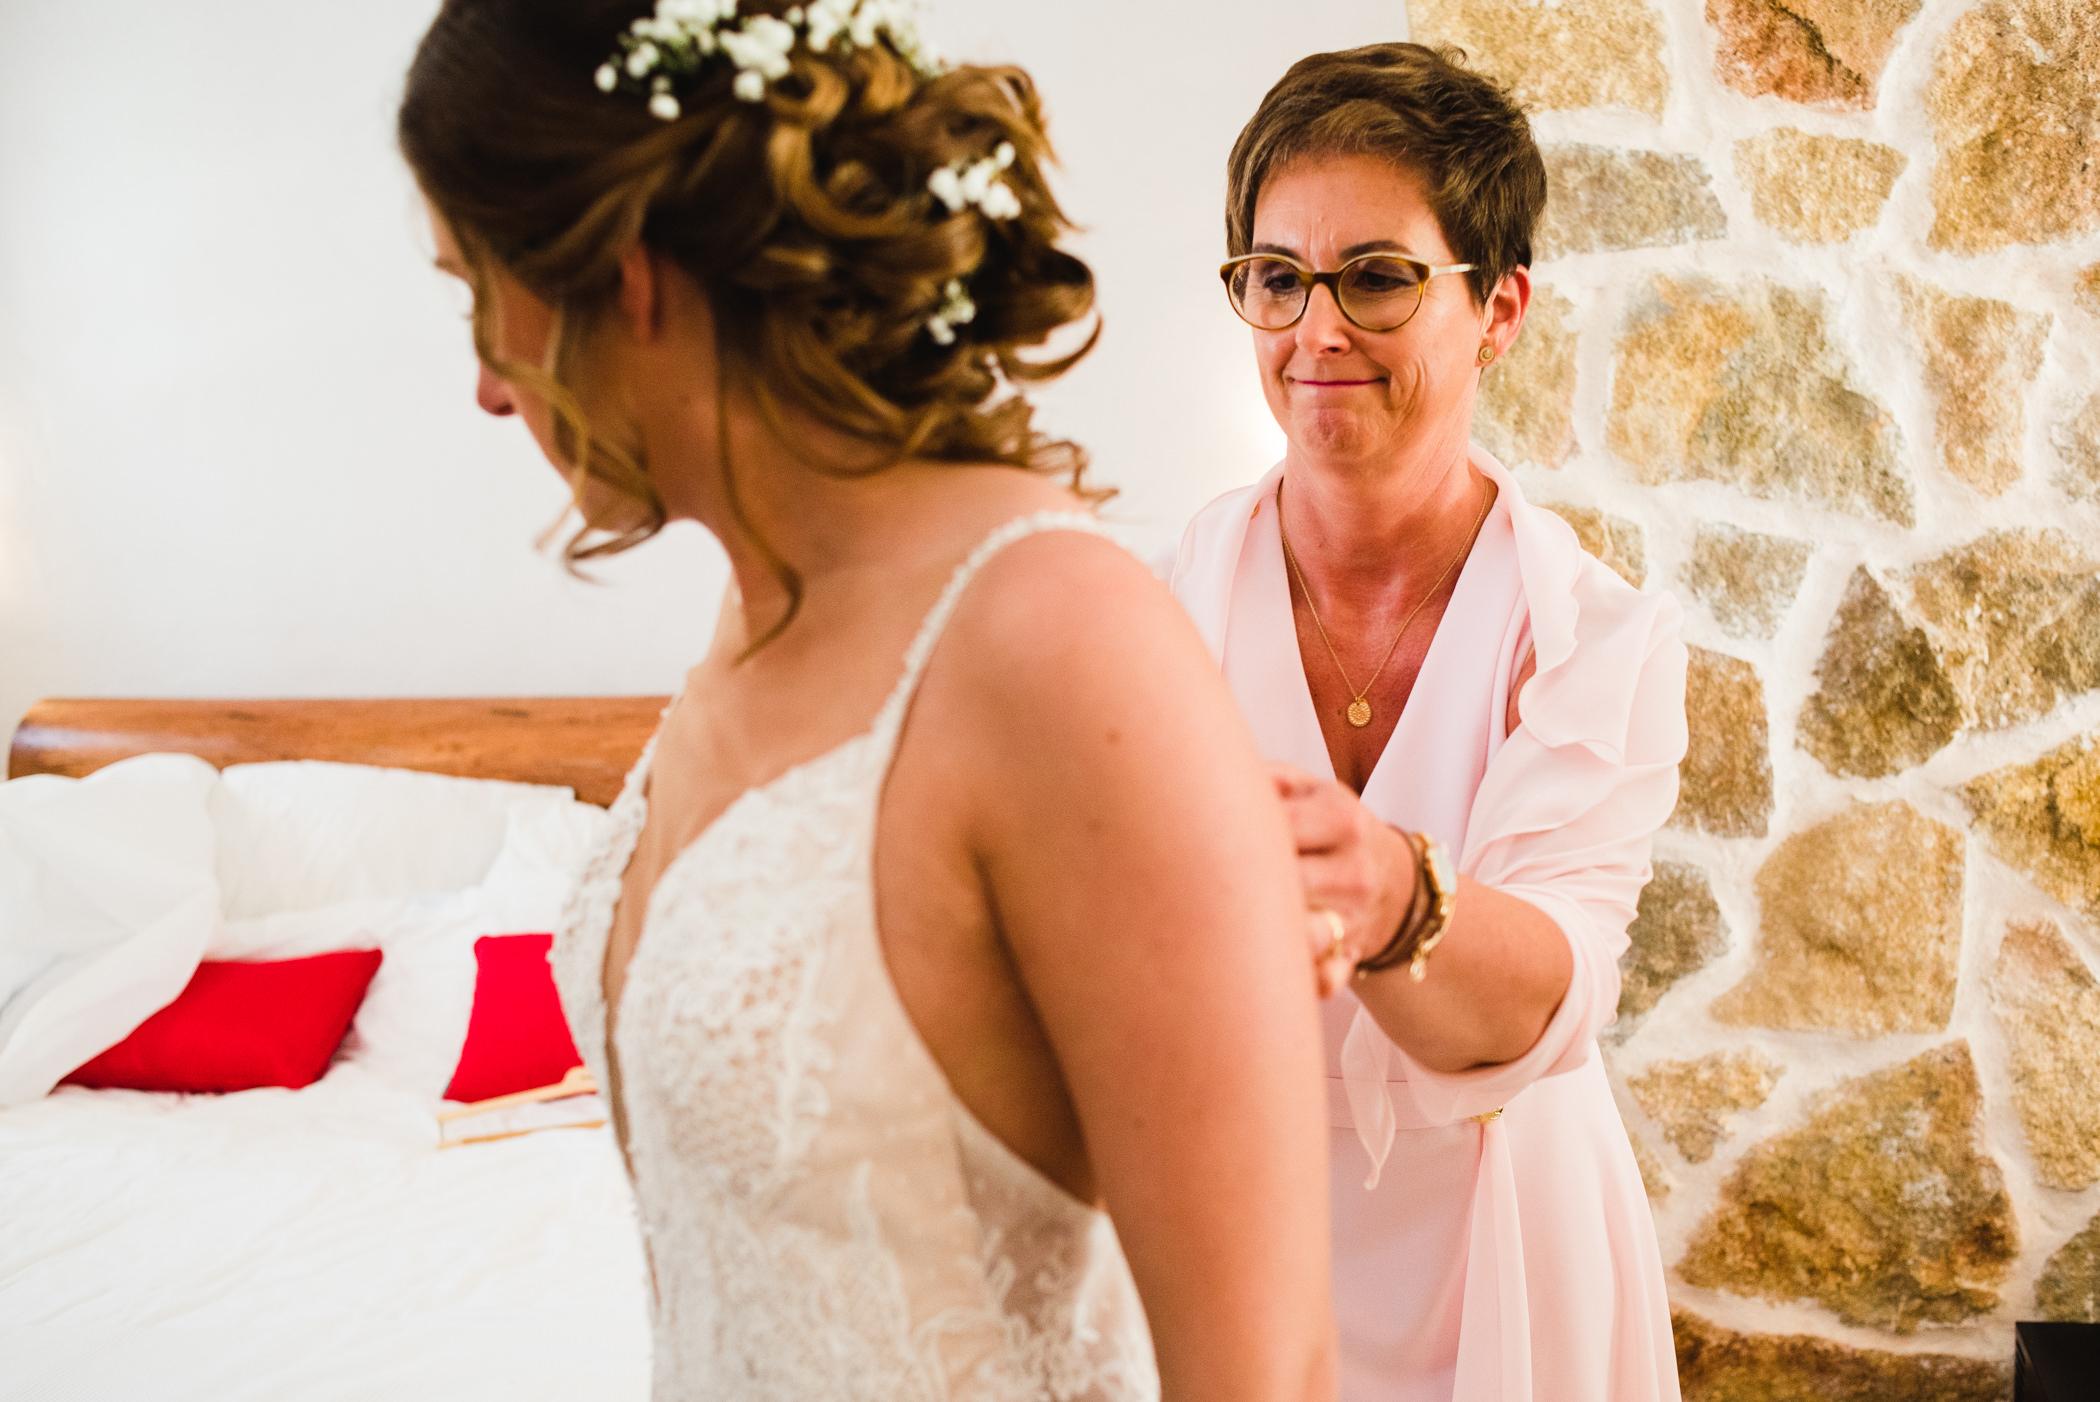 CAN-SERGENT-IBIZA-WEDDING-11.jpg